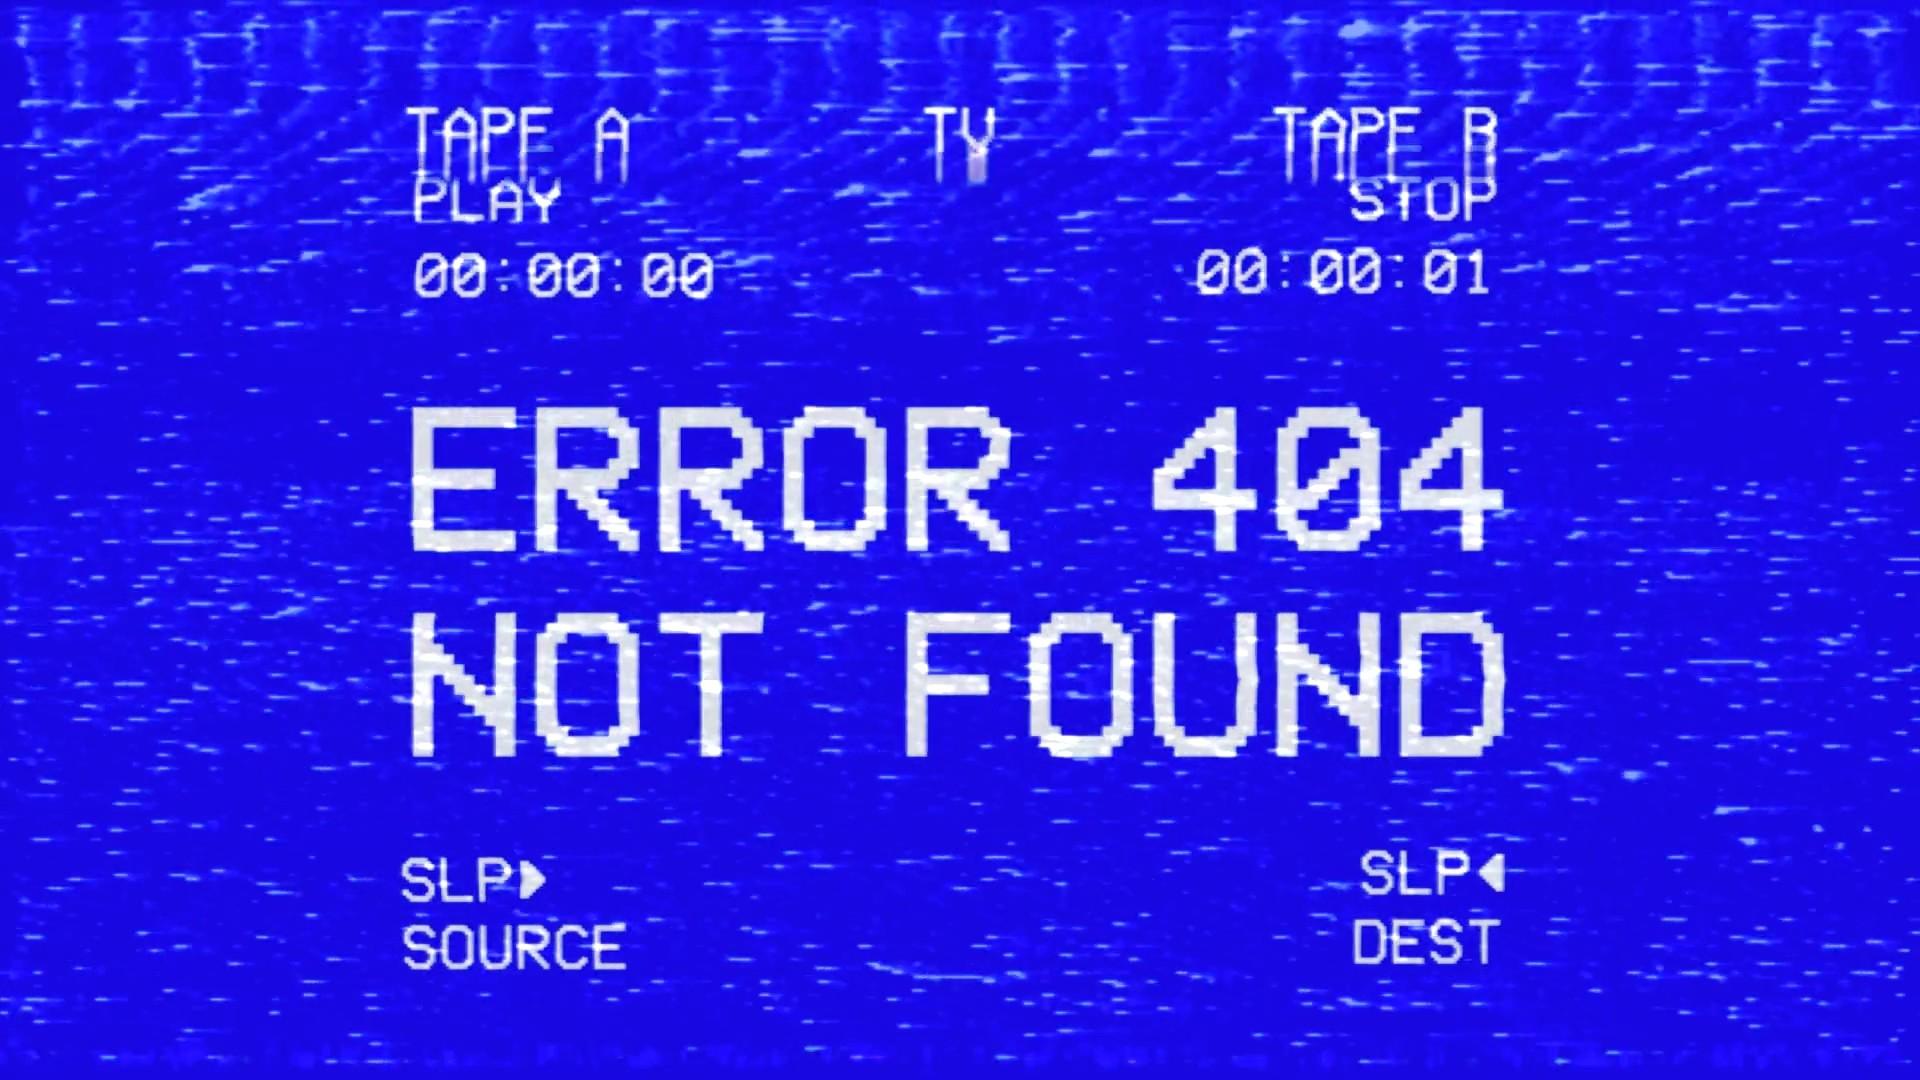 Error 404 Picture